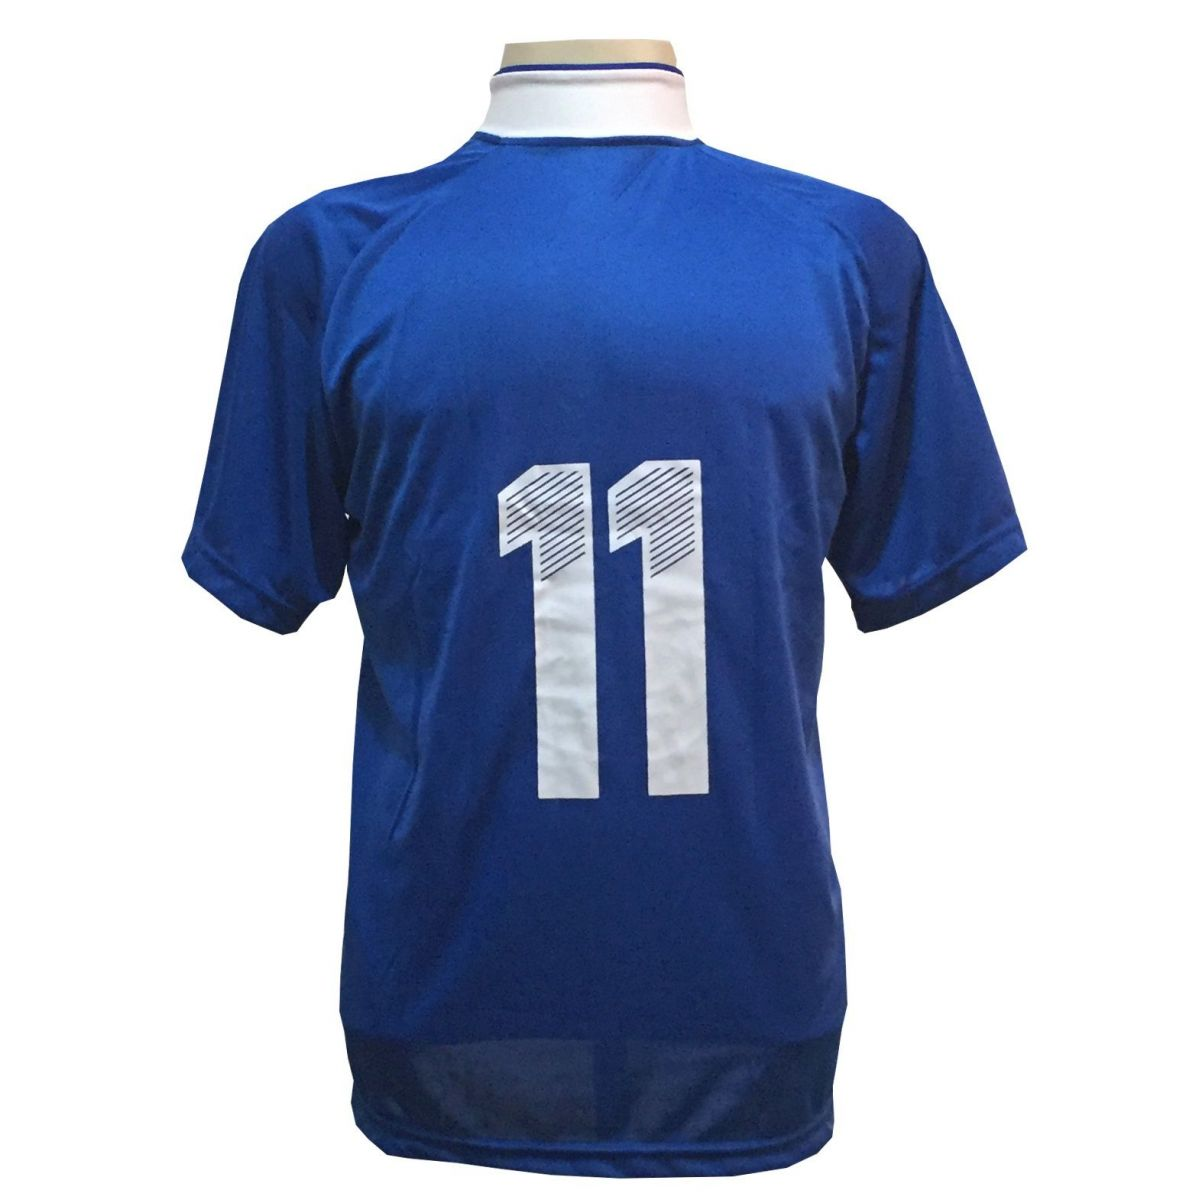 Jogo de Camisa com 20 unidades modelo Milan Royal/Branco